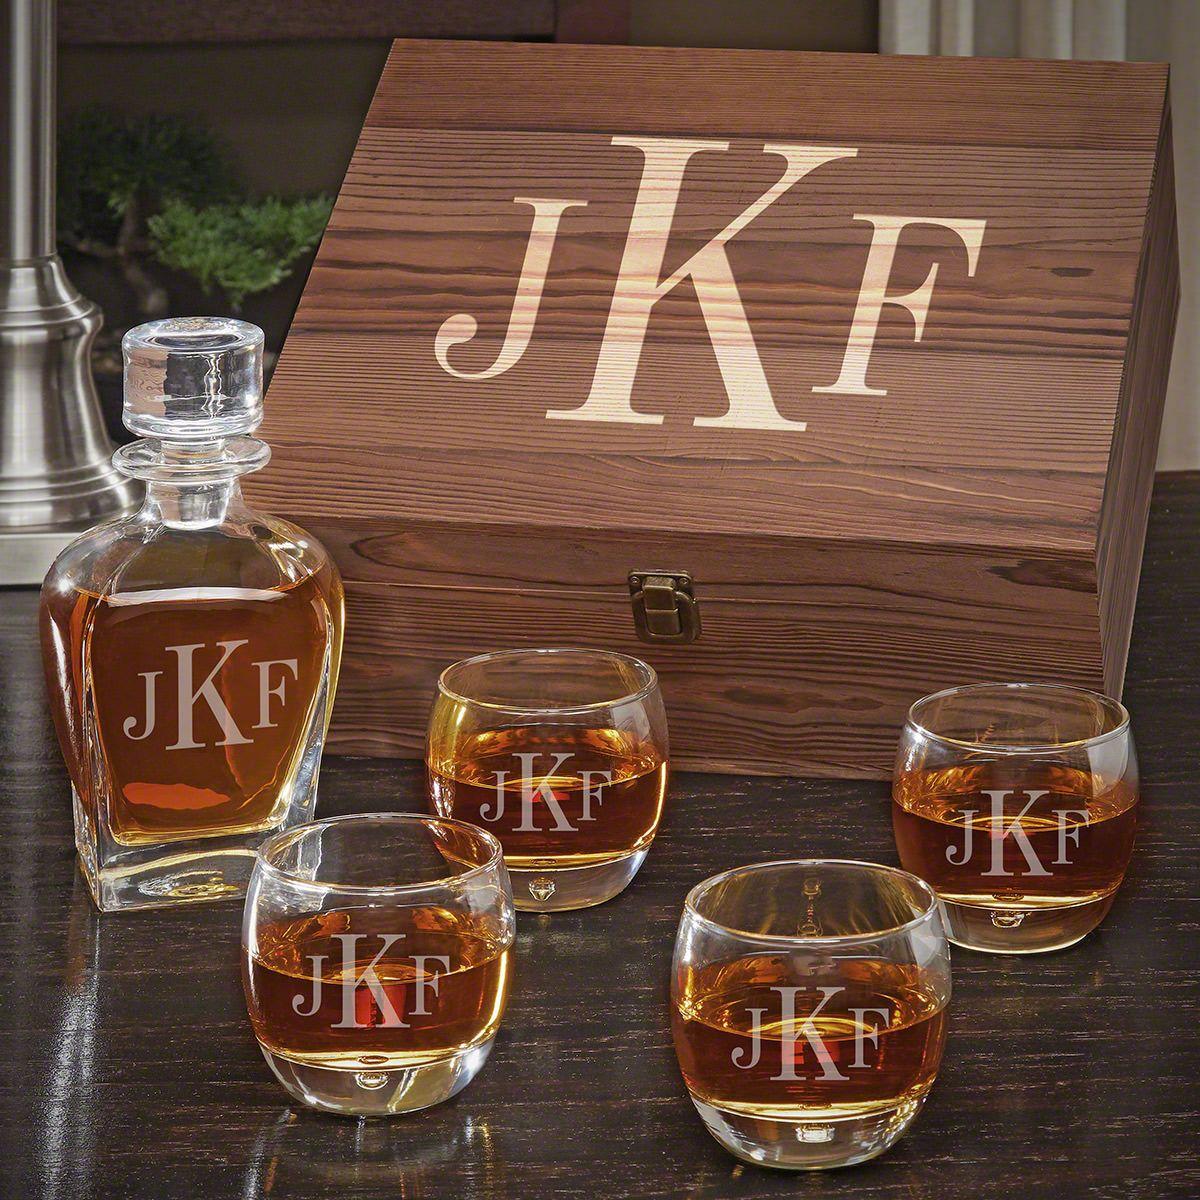 Classic Monogram Personalized Liquor Draper Decanter Set with Uptown Glasses